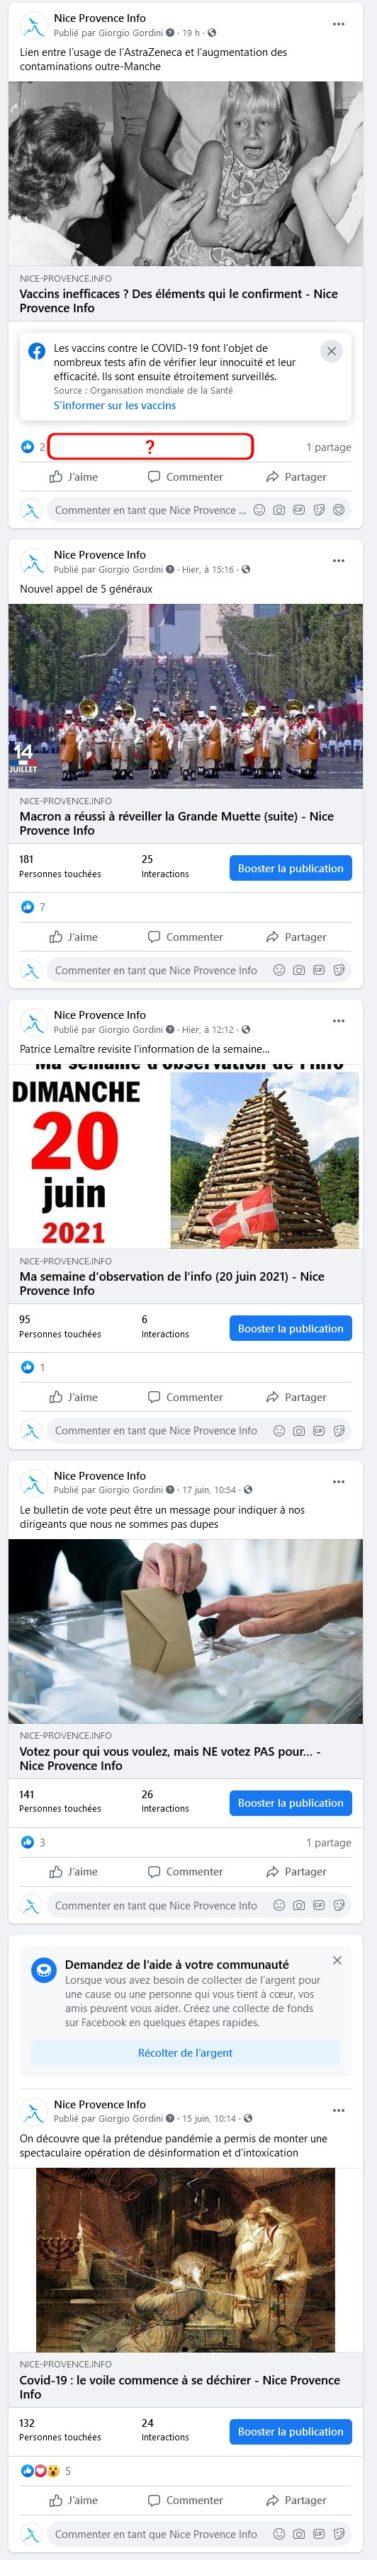 Censure Facebook - 21 juin 2021